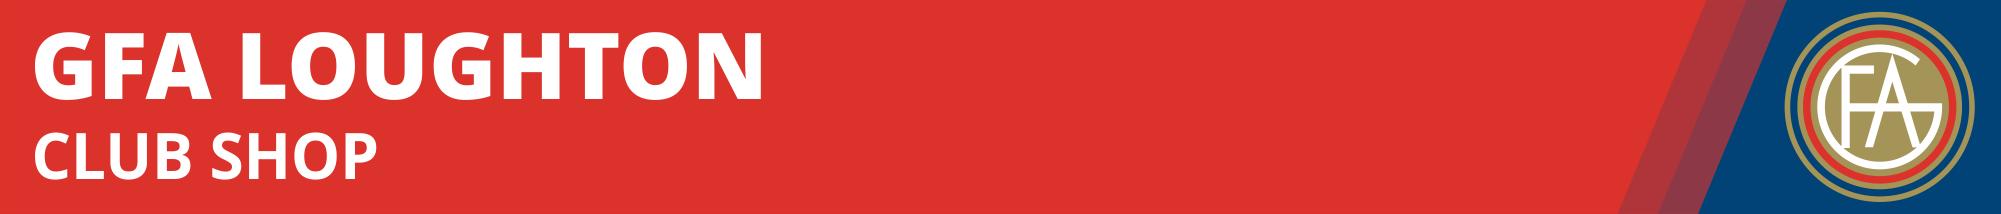 gfa-loughton-club-shop-banner.png